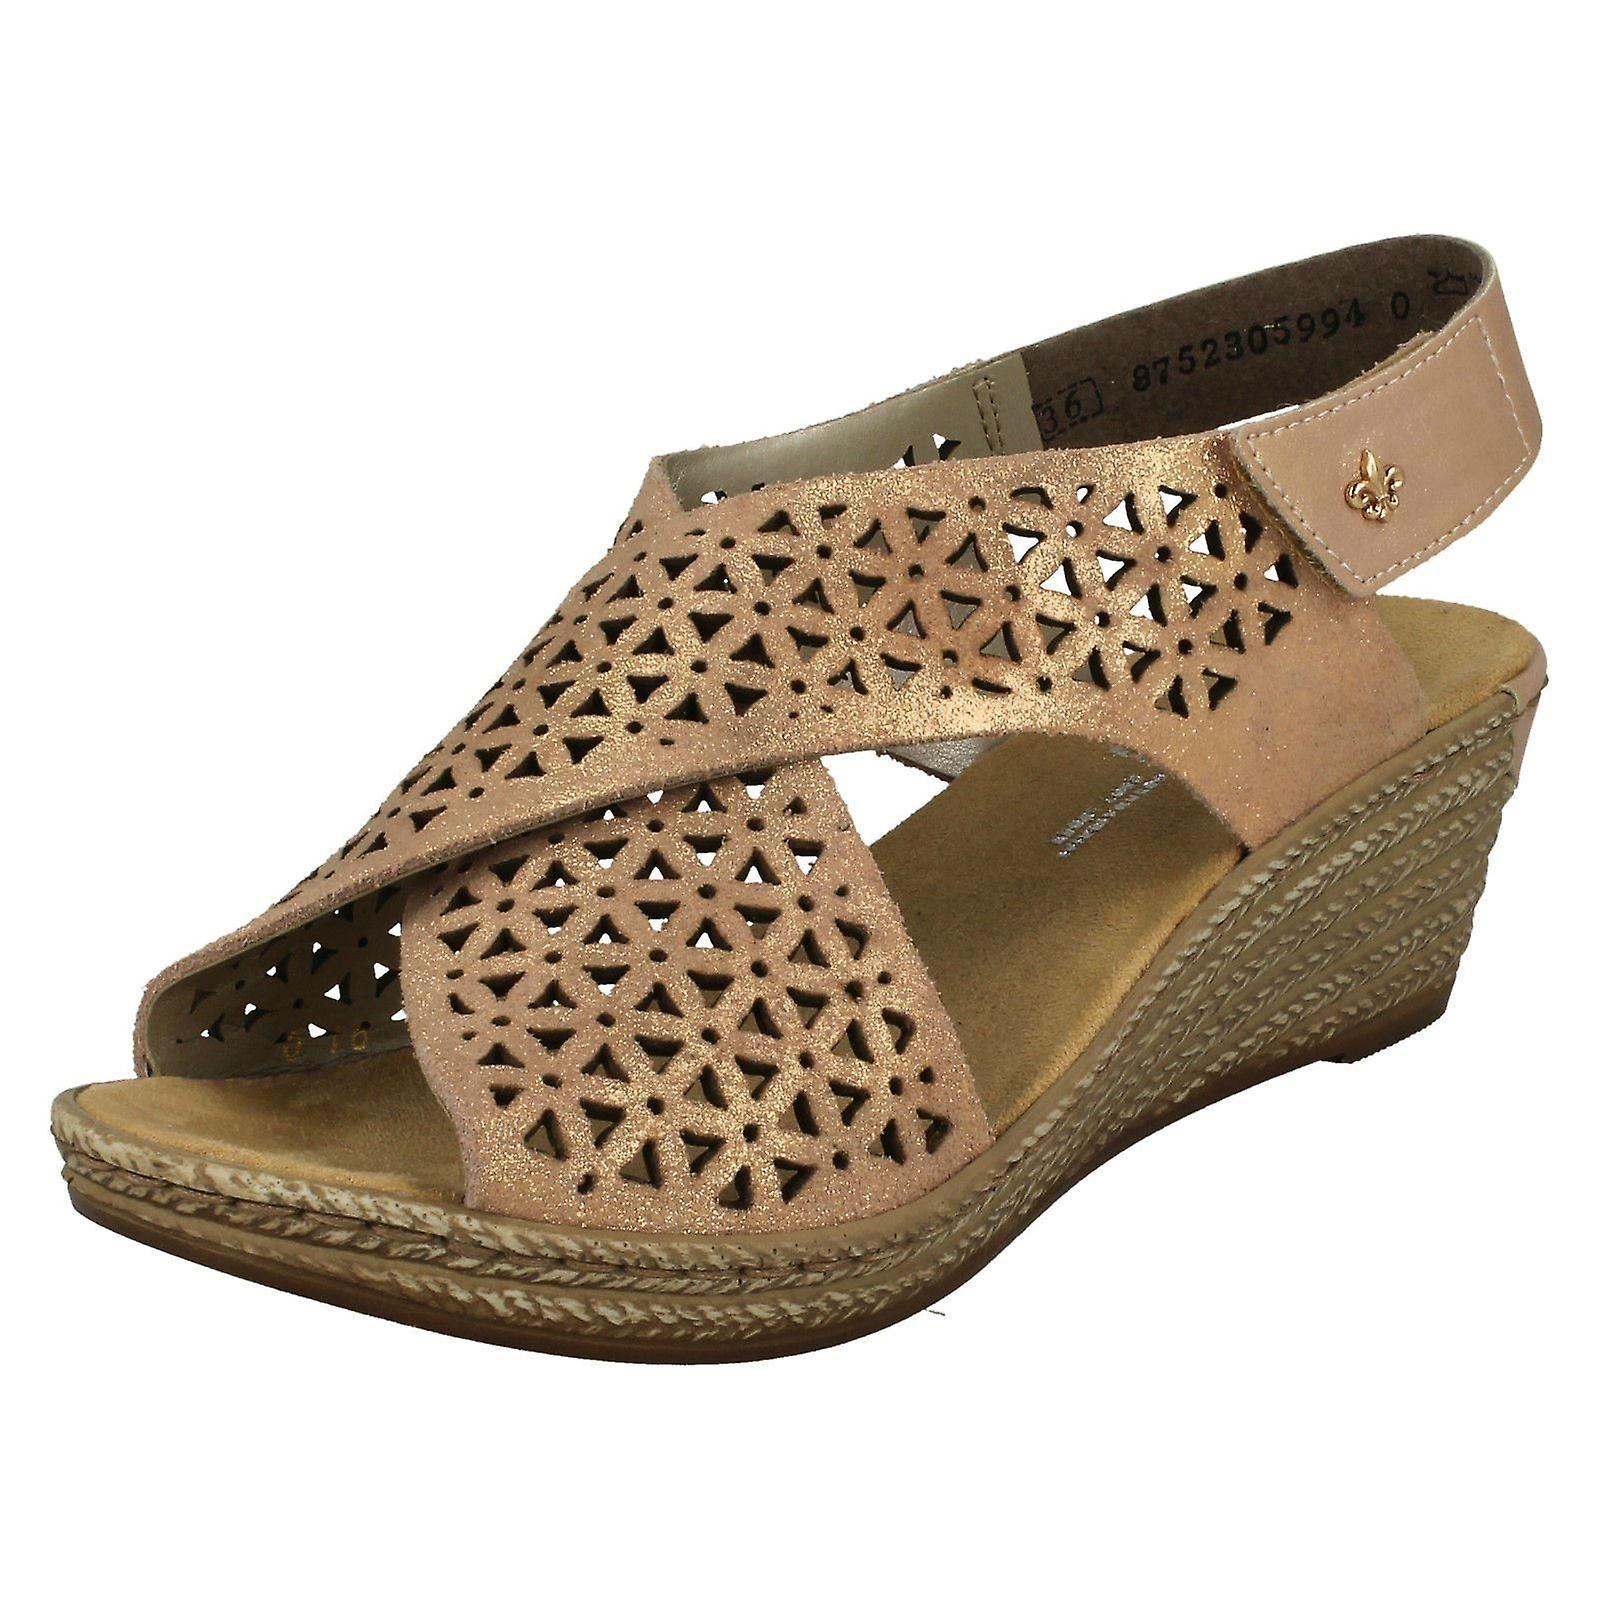 Ladies Rieker Wedged Heel Slingback Sandals 62484 31 Rosa Leather UK Size 4 EU Size 37 US Size 6